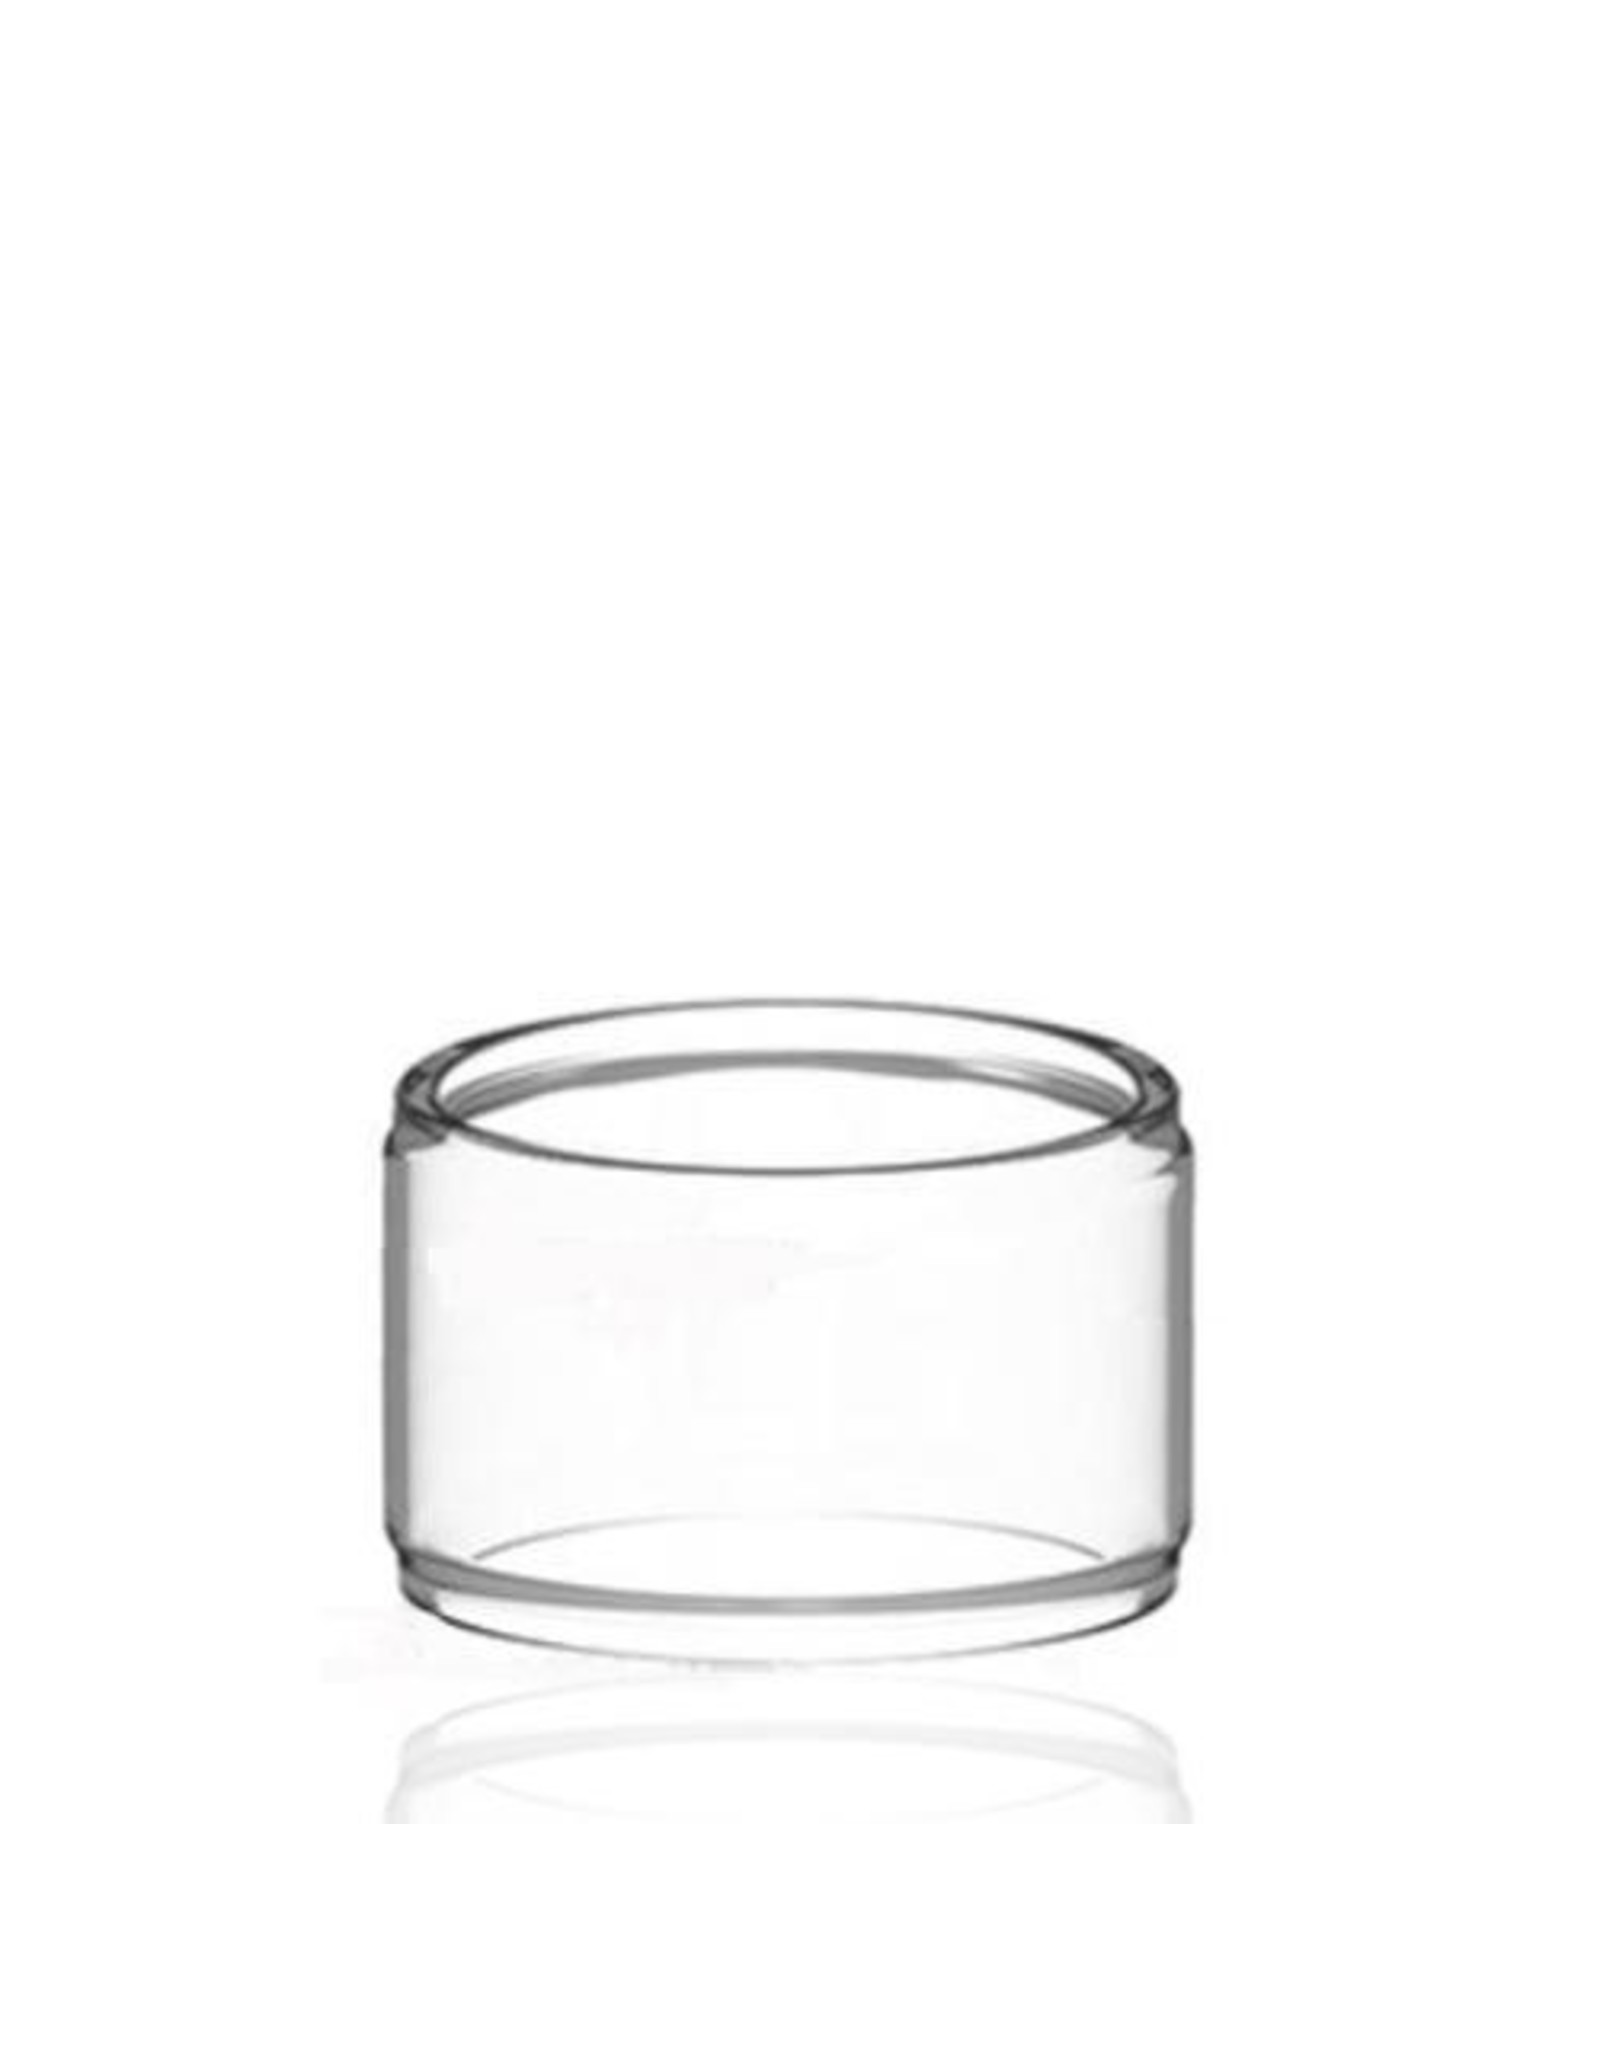 Aspire Aspire Odan Replacement Glass Pyrex 7ml